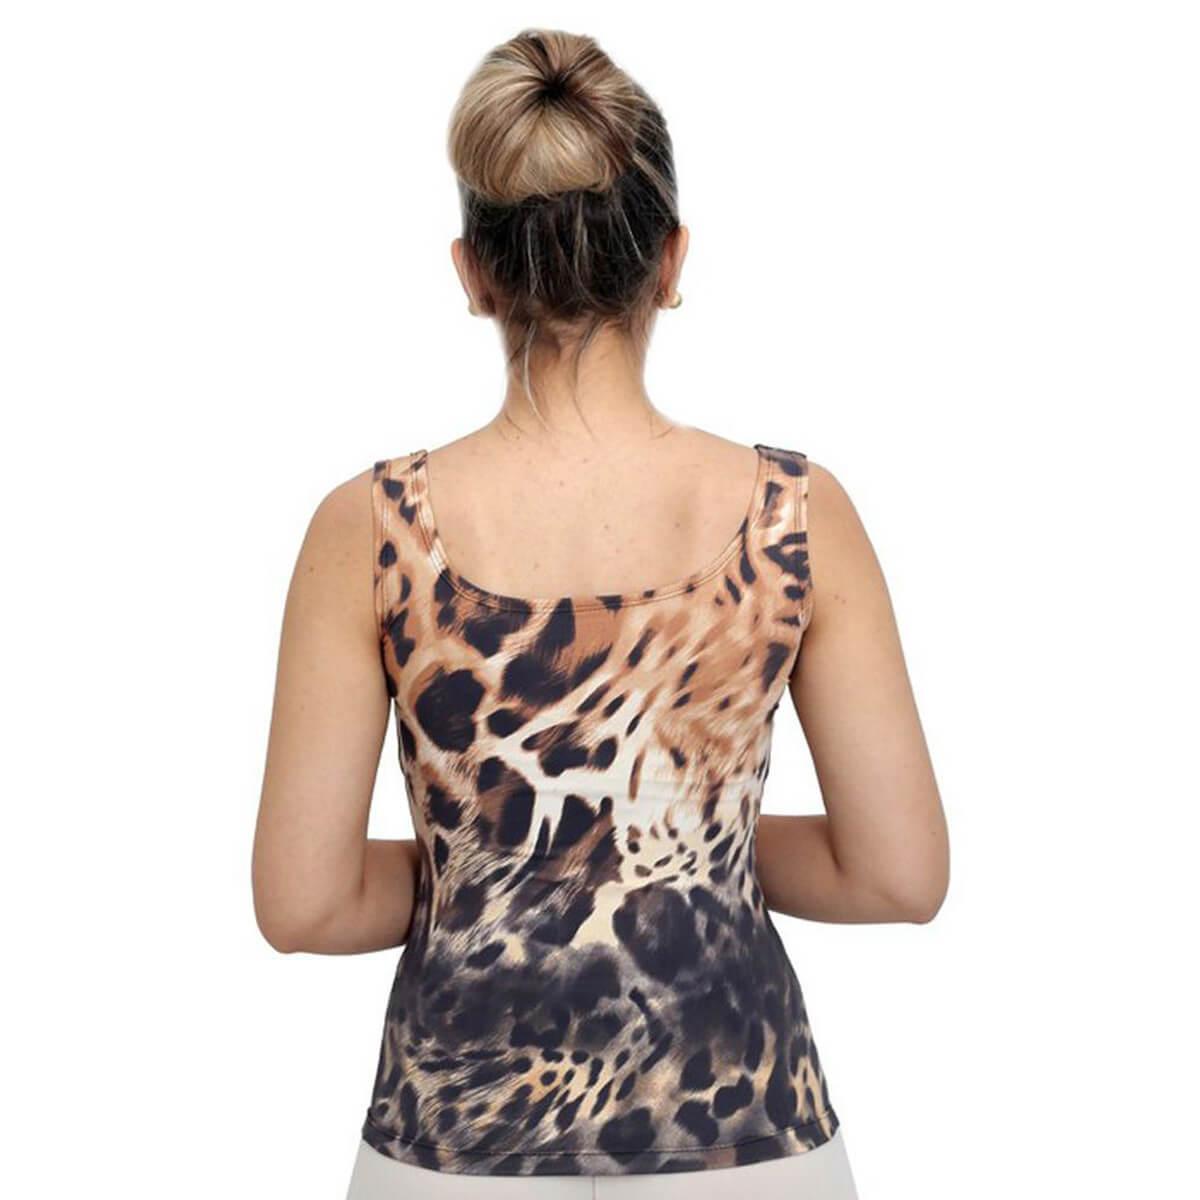 Regata Feminina Estampa Animal Print Onça Decote Redondo